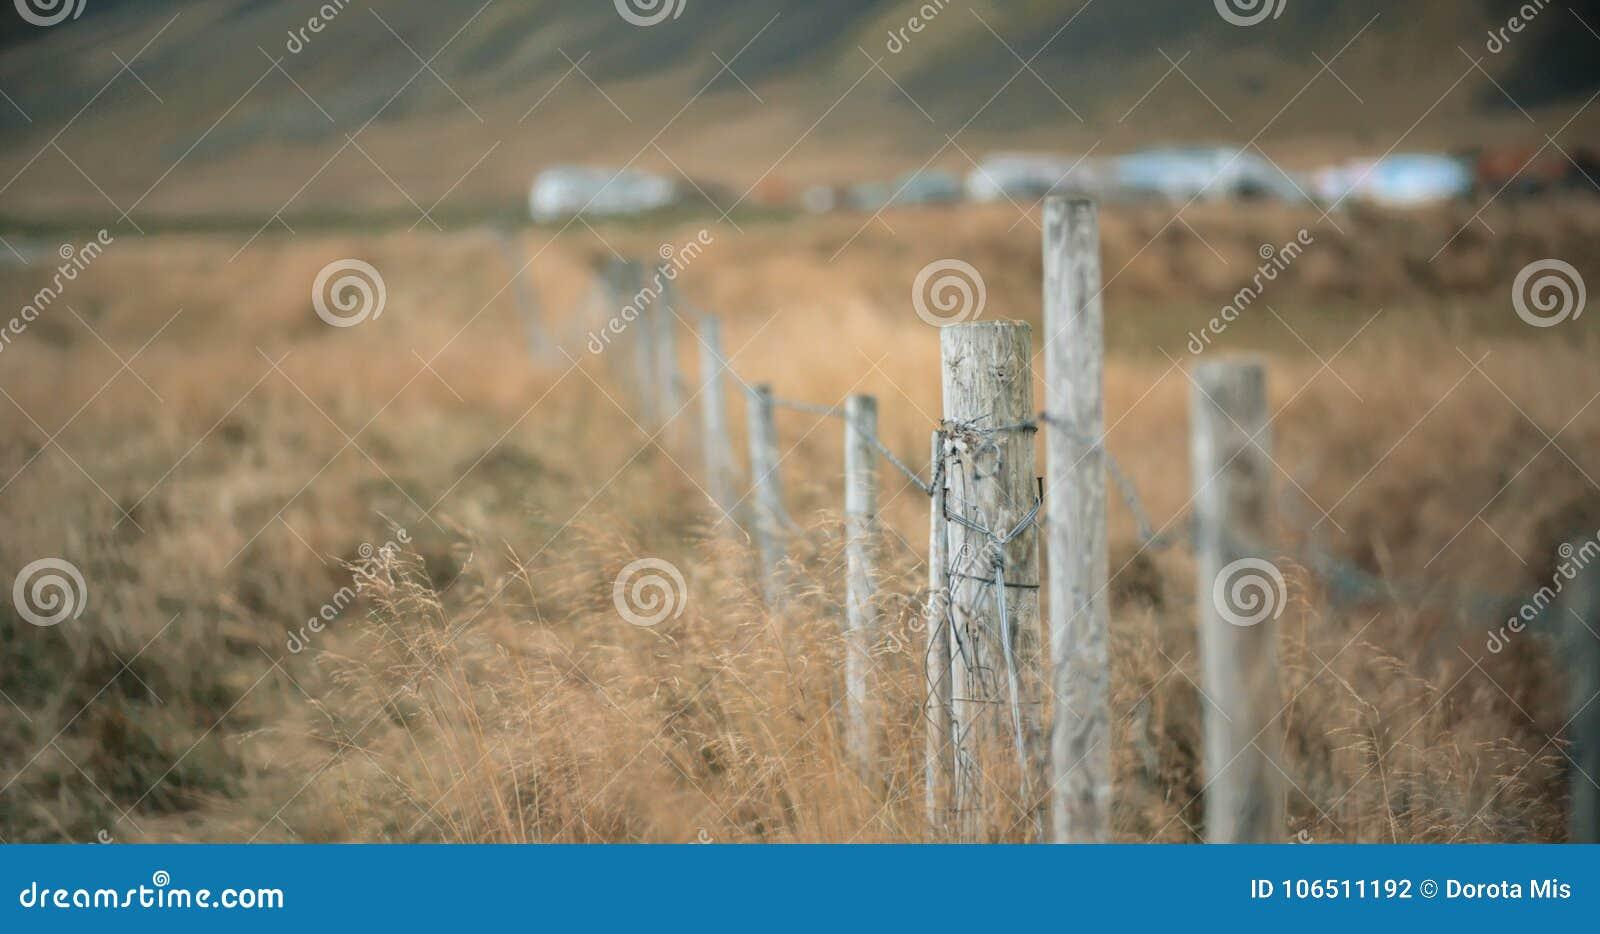 wire farm fence. Royalty-Free Stock Photo Wire Farm Fence